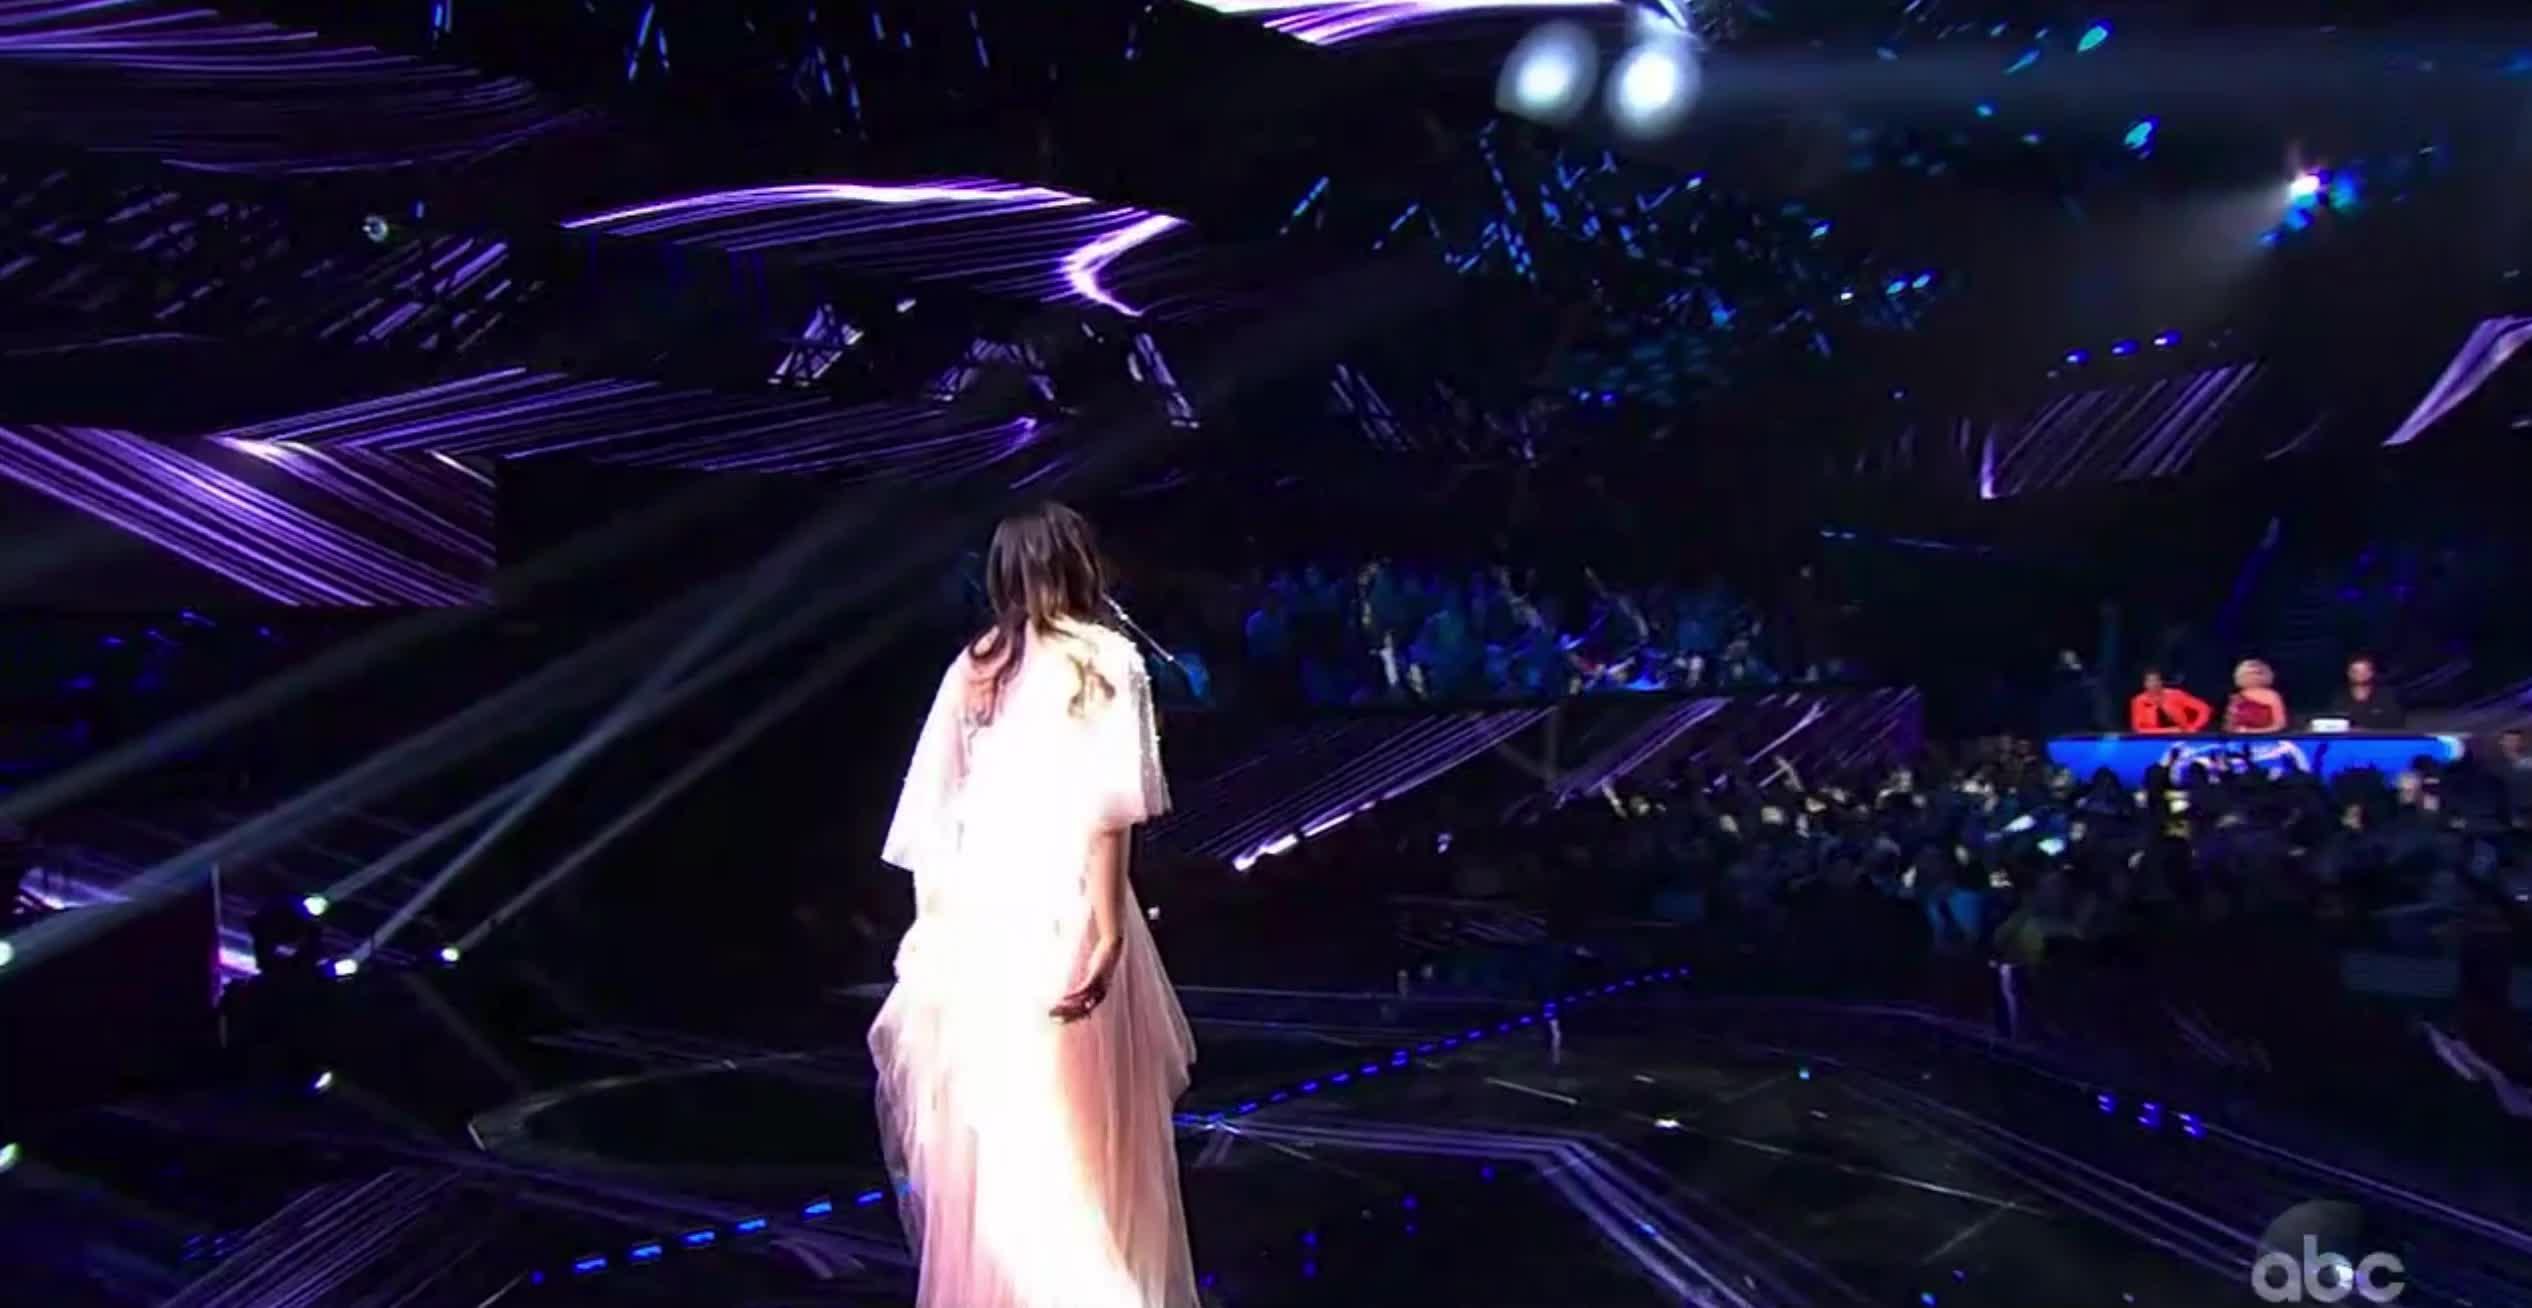 alyssa raghu, american idol, american idol season 17, americanidol, katy perry, lionel richie, luke bryan, ryan seacrest, season 17, singing, American Idol Alyssa Performing GIFs